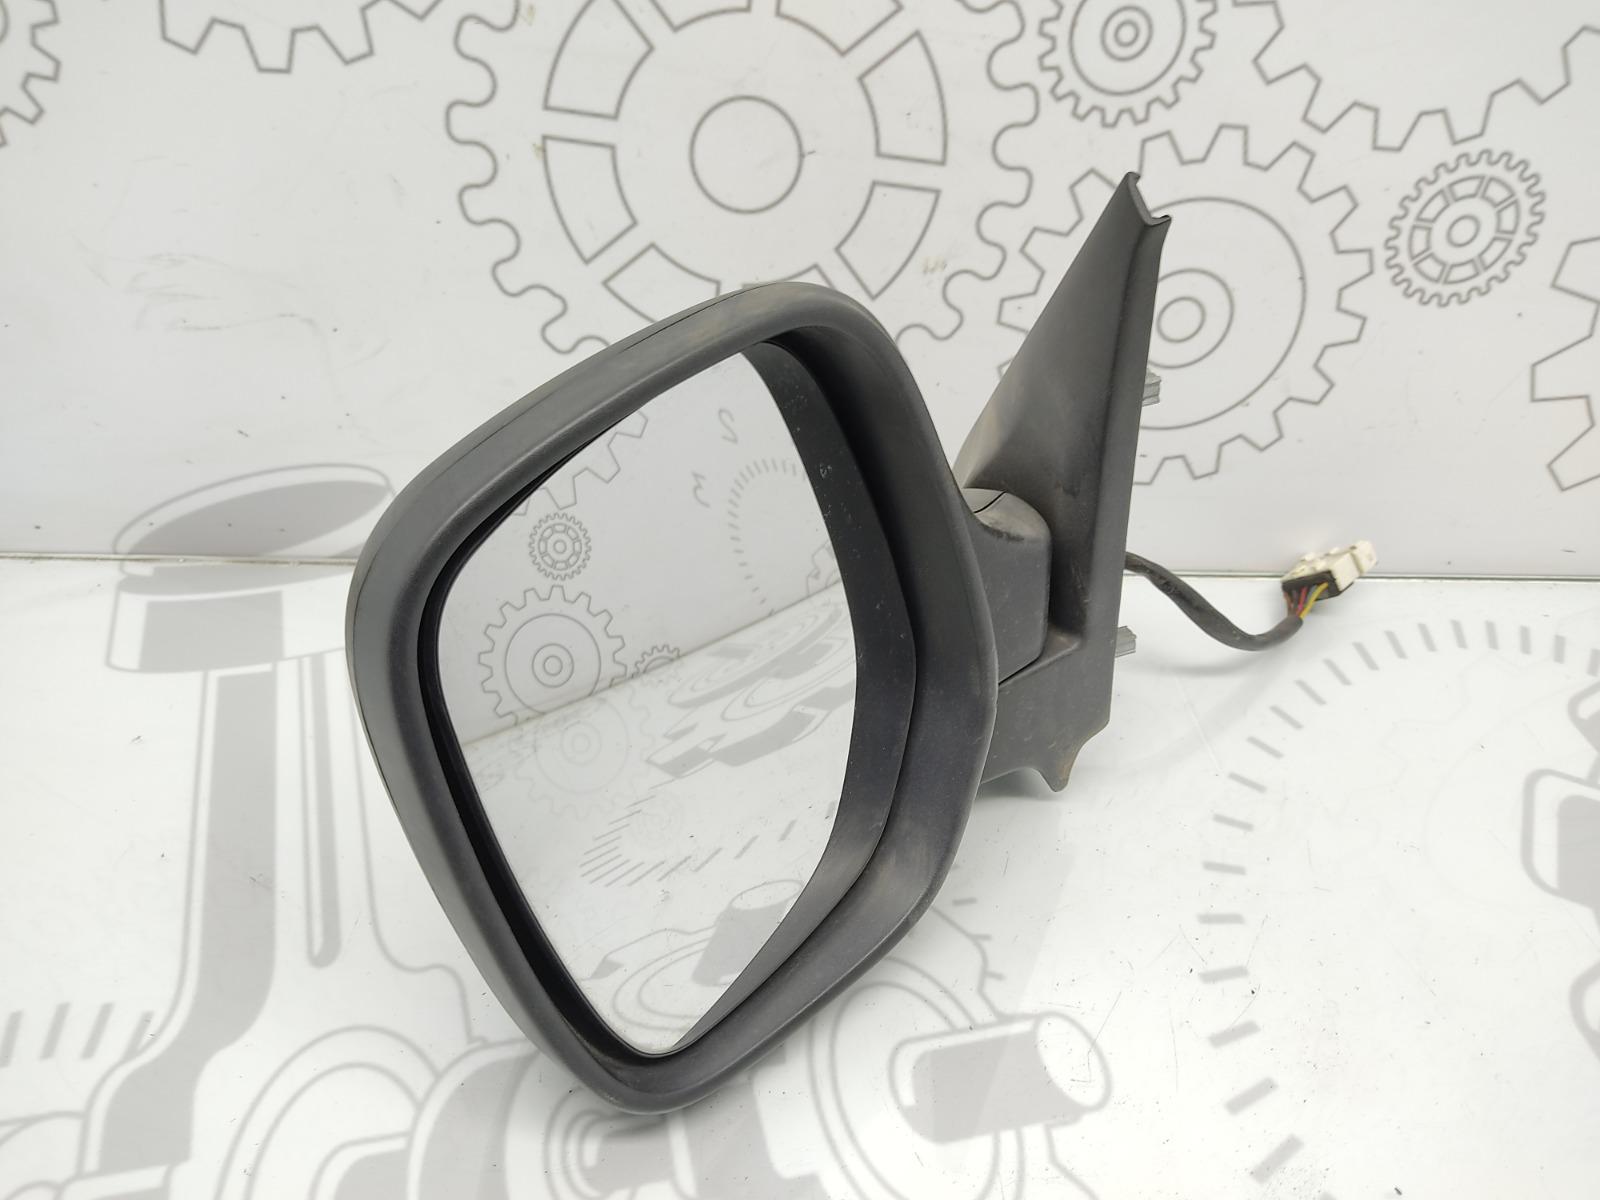 Зеркало наружное левое Citroen Berlingo 1 2.0 HDI 2005 (б/у)